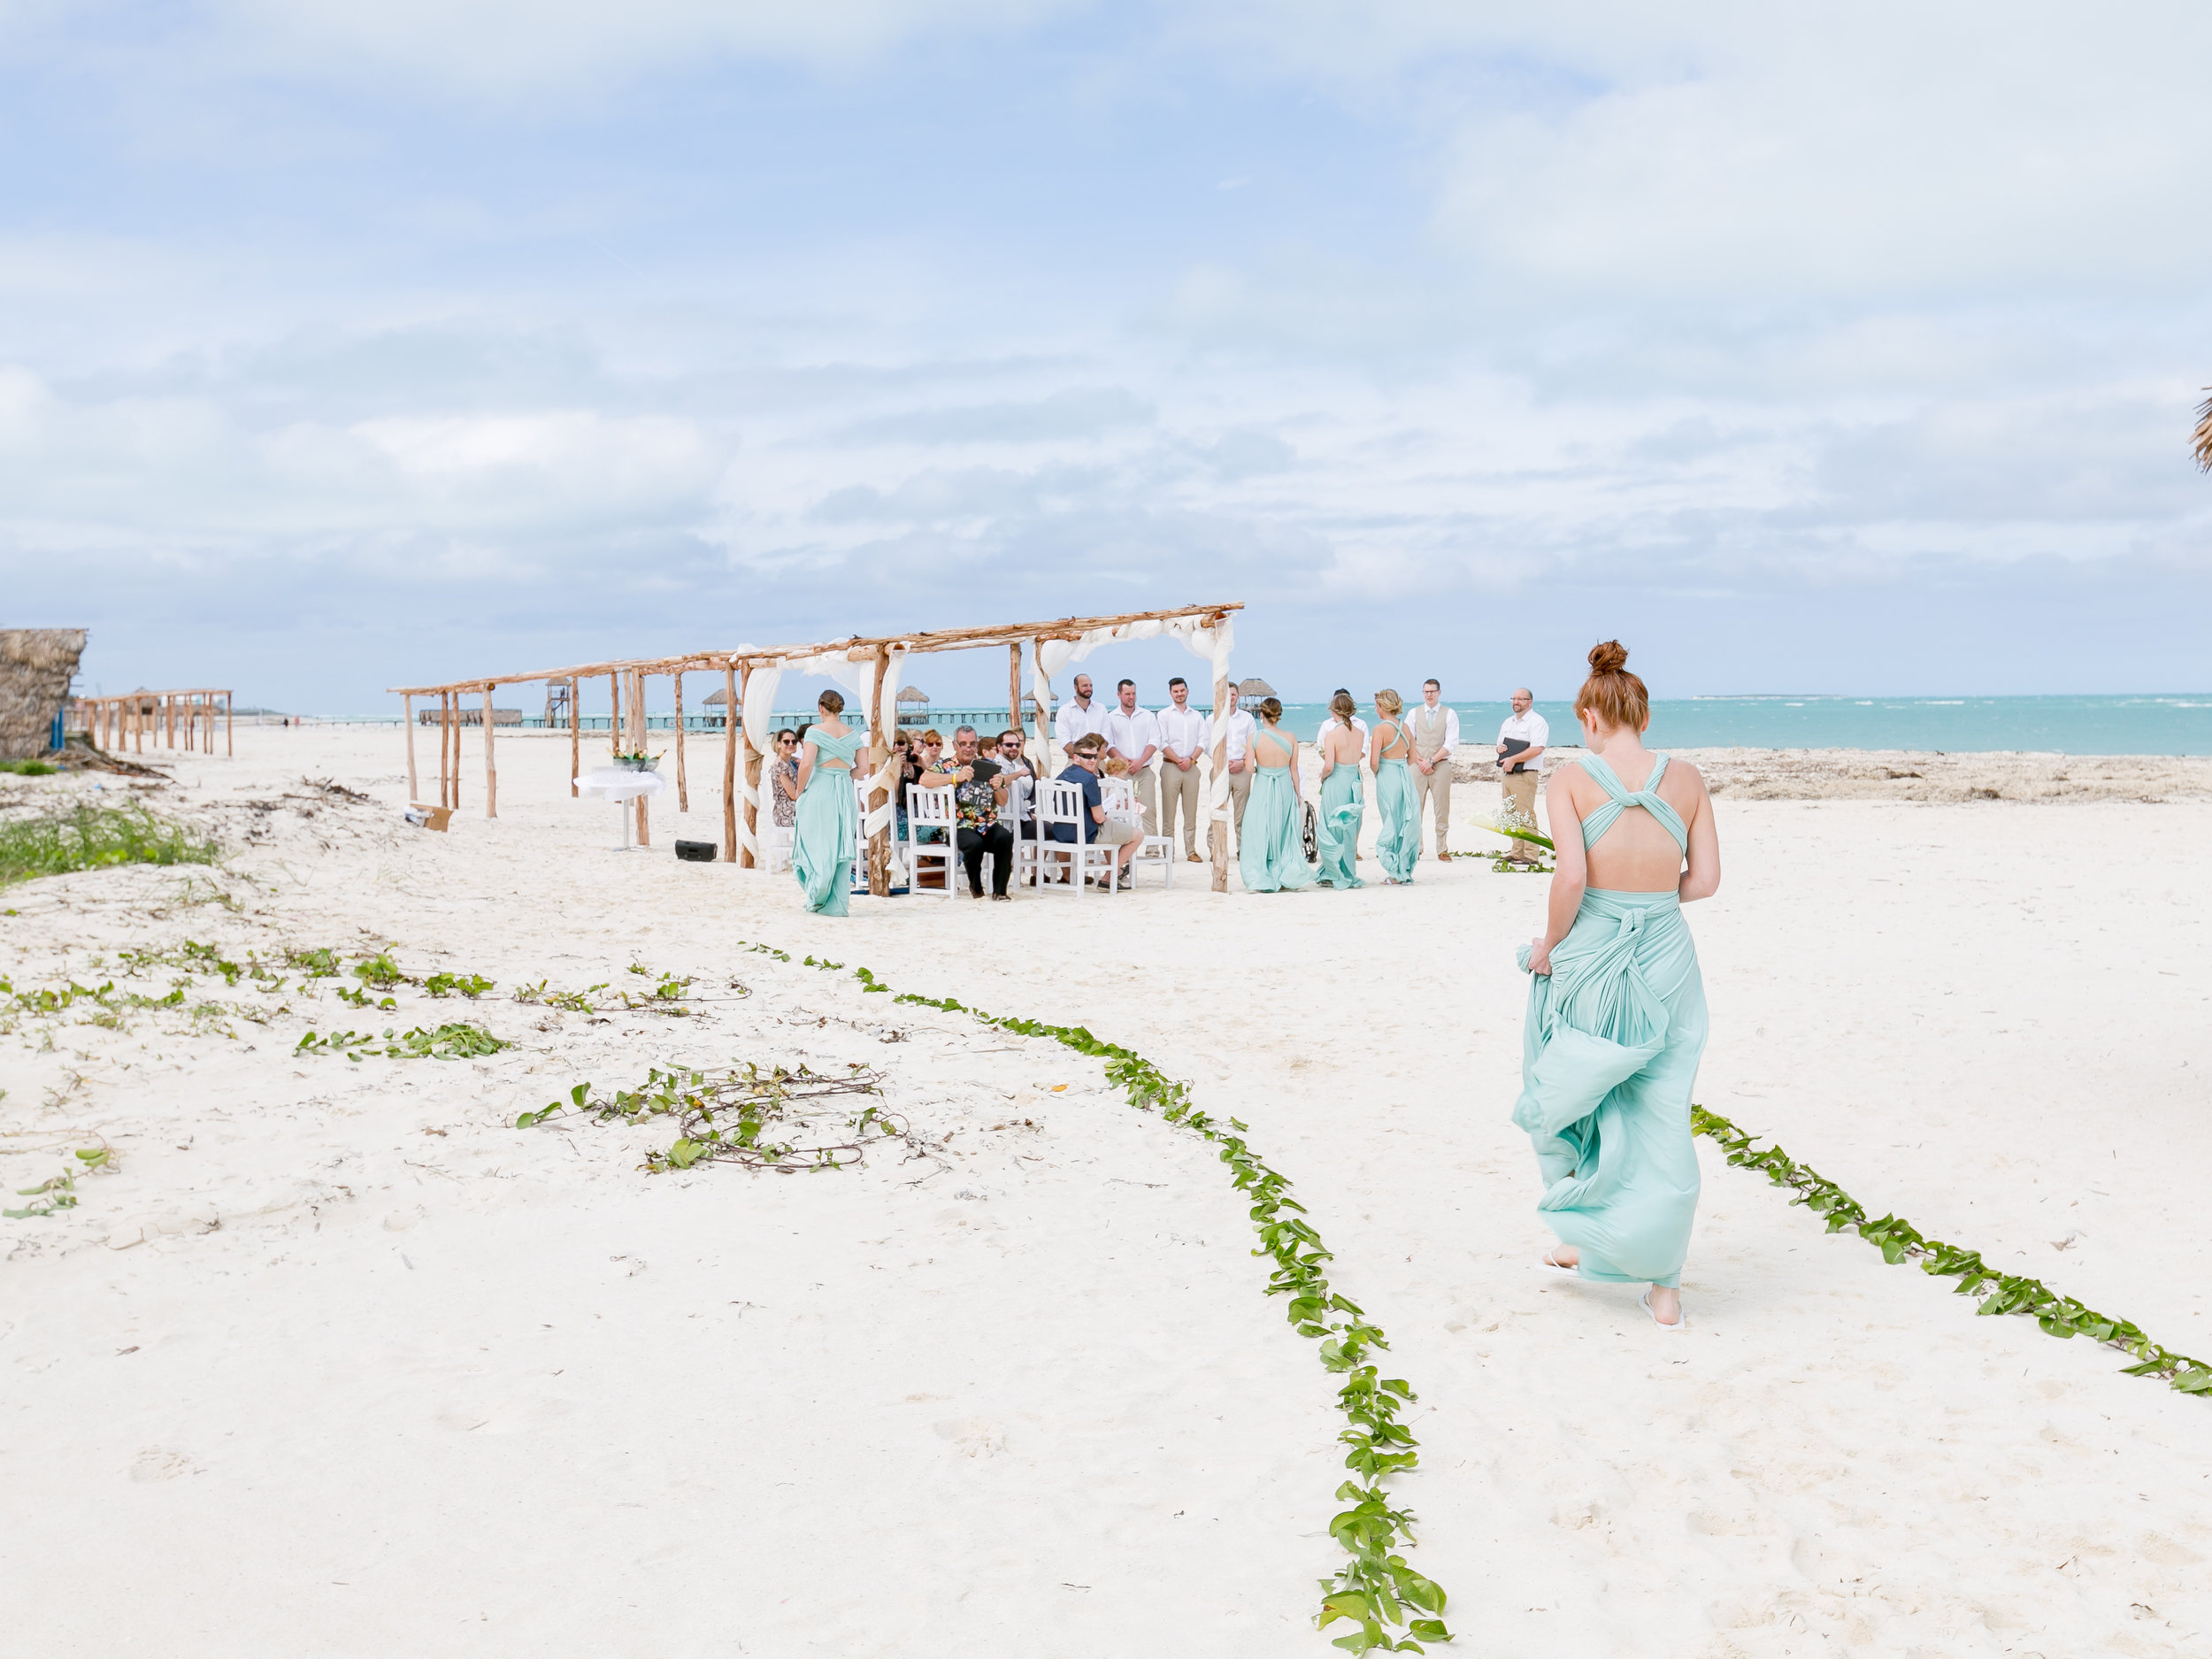 Cayco-Coco-Cuba-Wedding-262.jpg